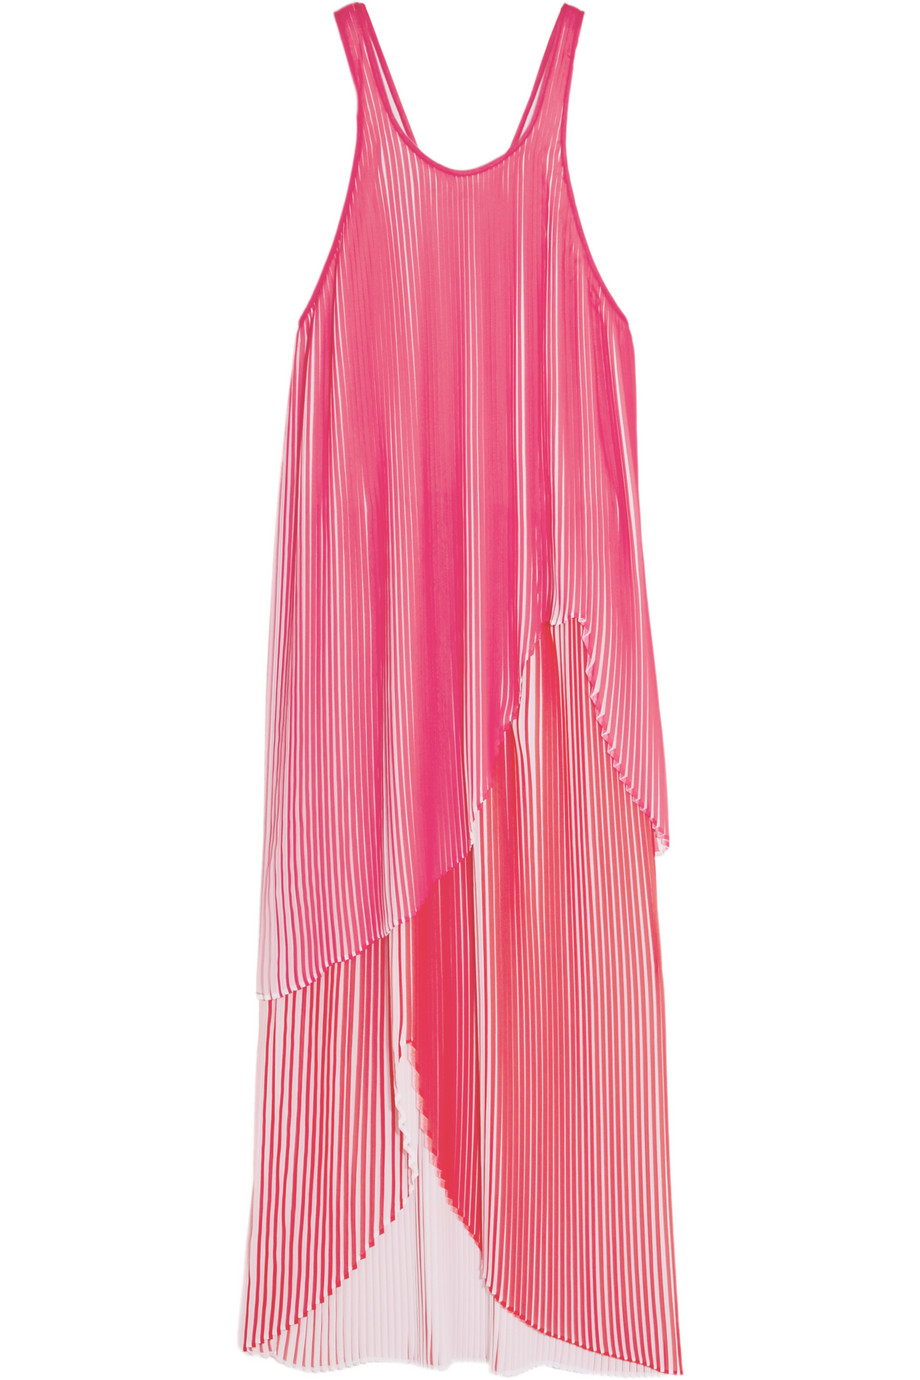 Stella Mccartney Primrose Plissé-Georgette Midi Dress, Fuchsia/Red, Women's, Size: 38